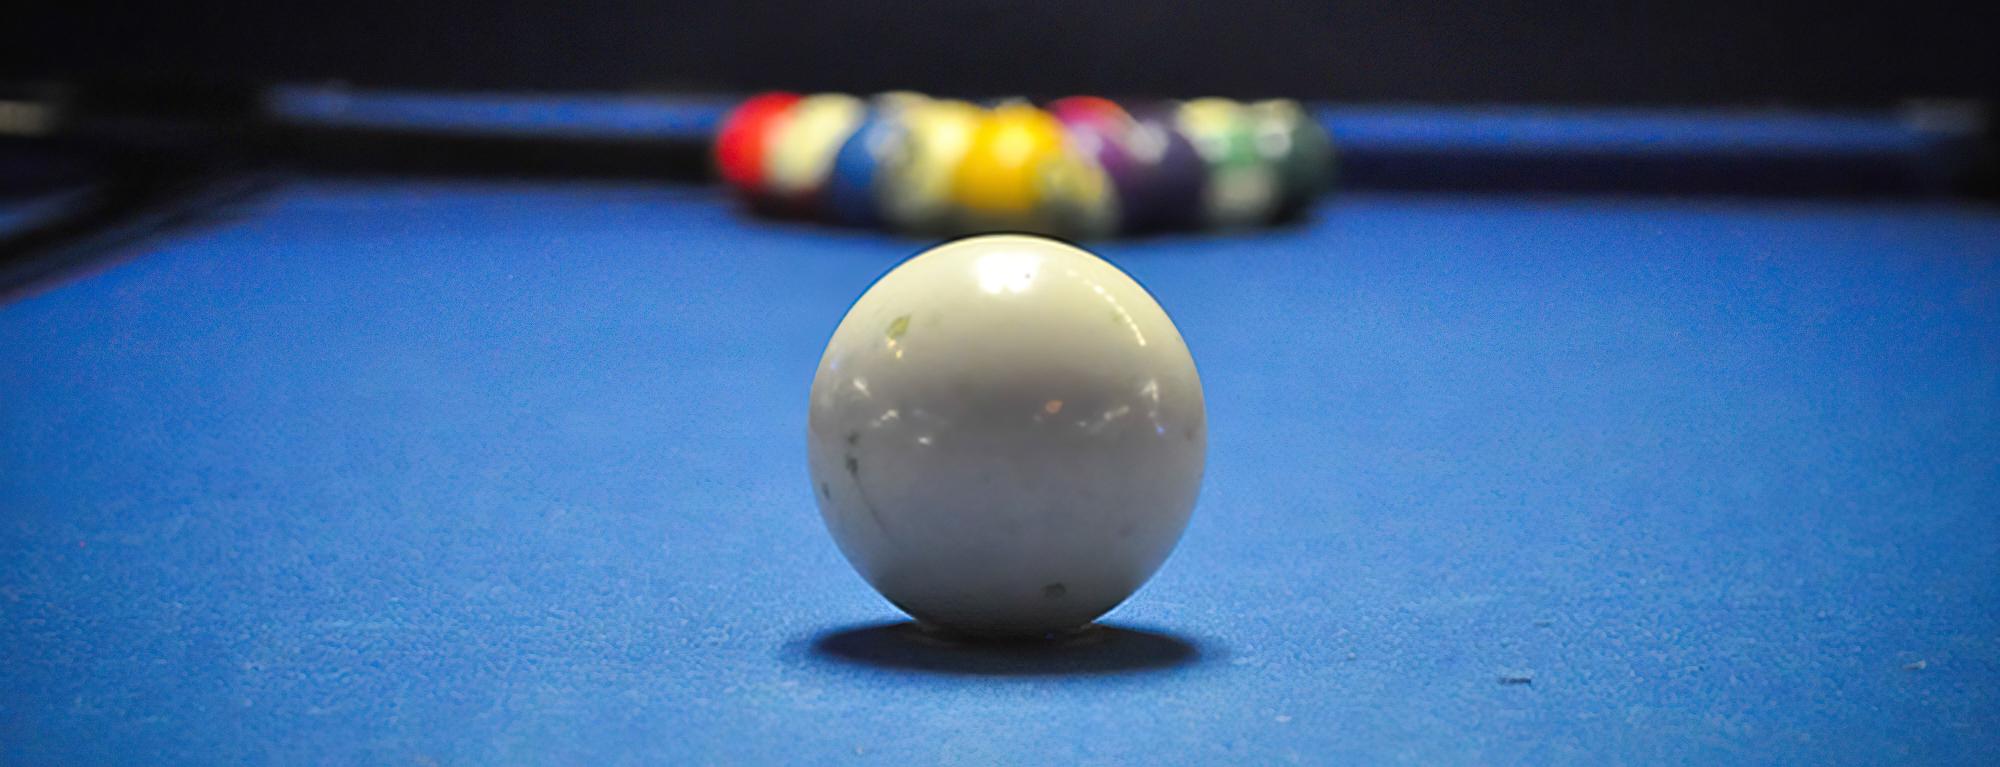 Billiards at Emerald Lanes